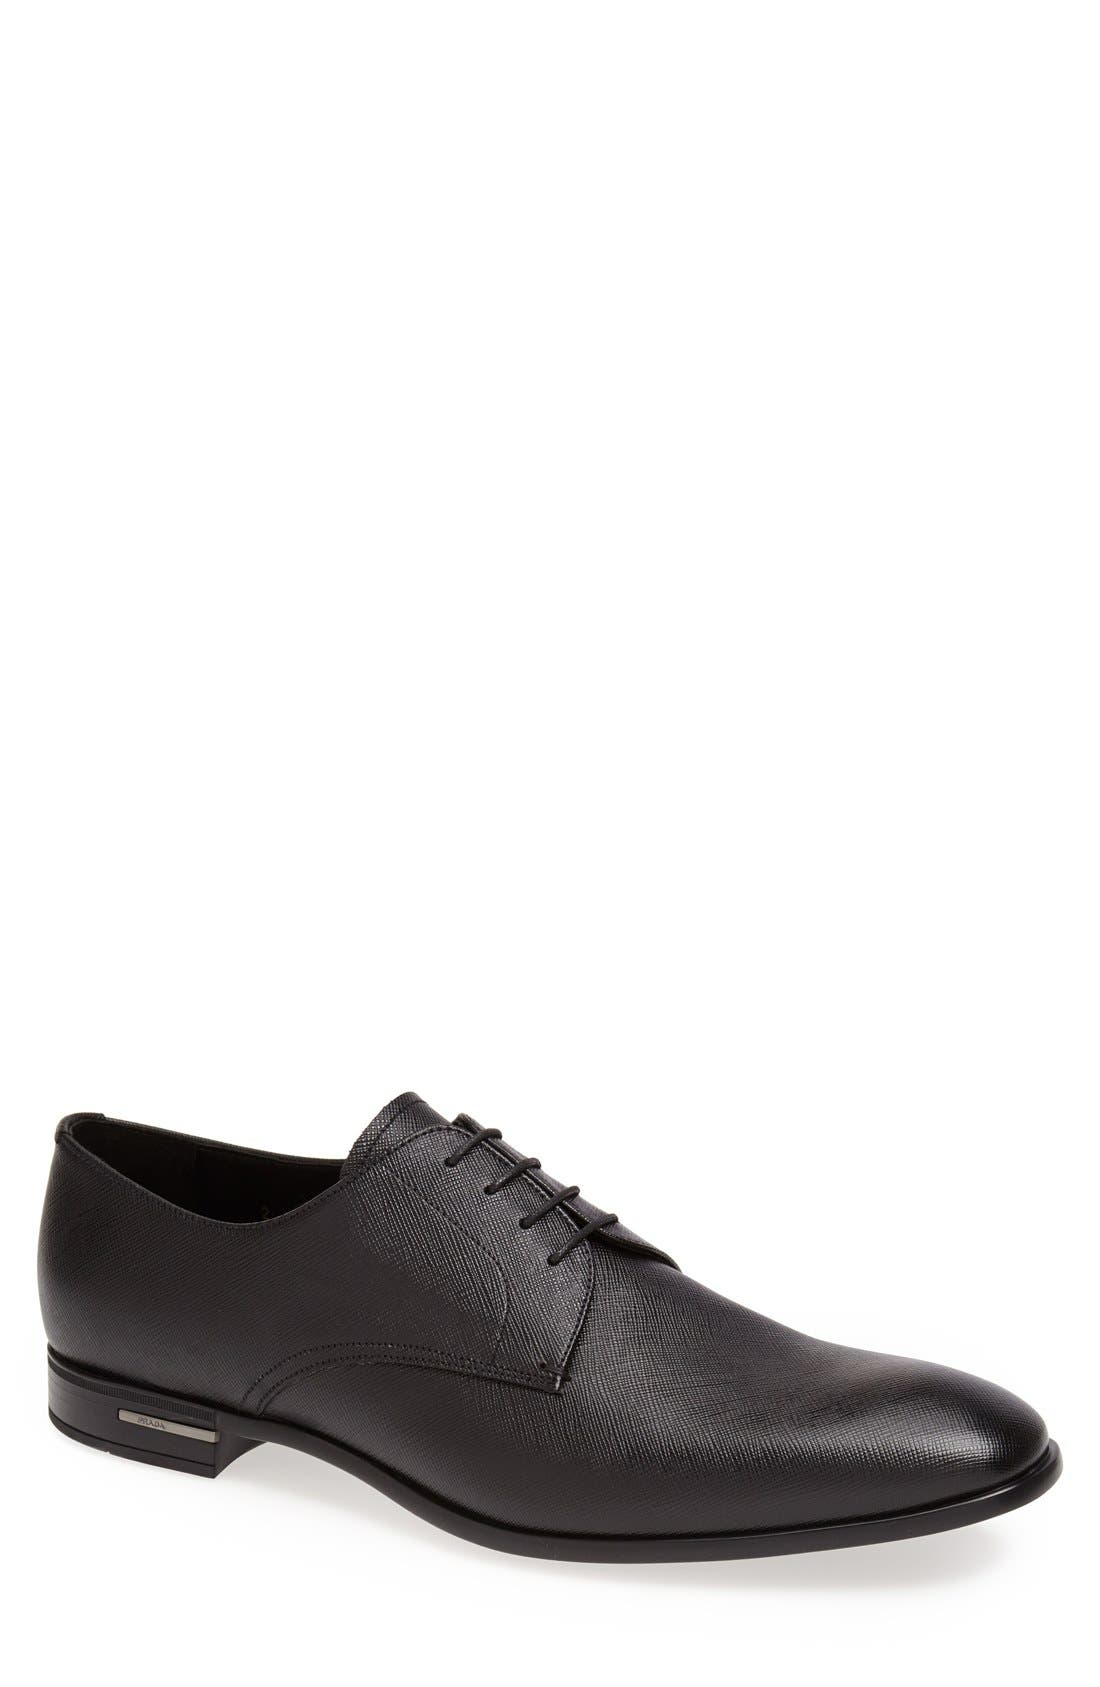 PRADA Plain Toe Derby, Main, color, BLACK